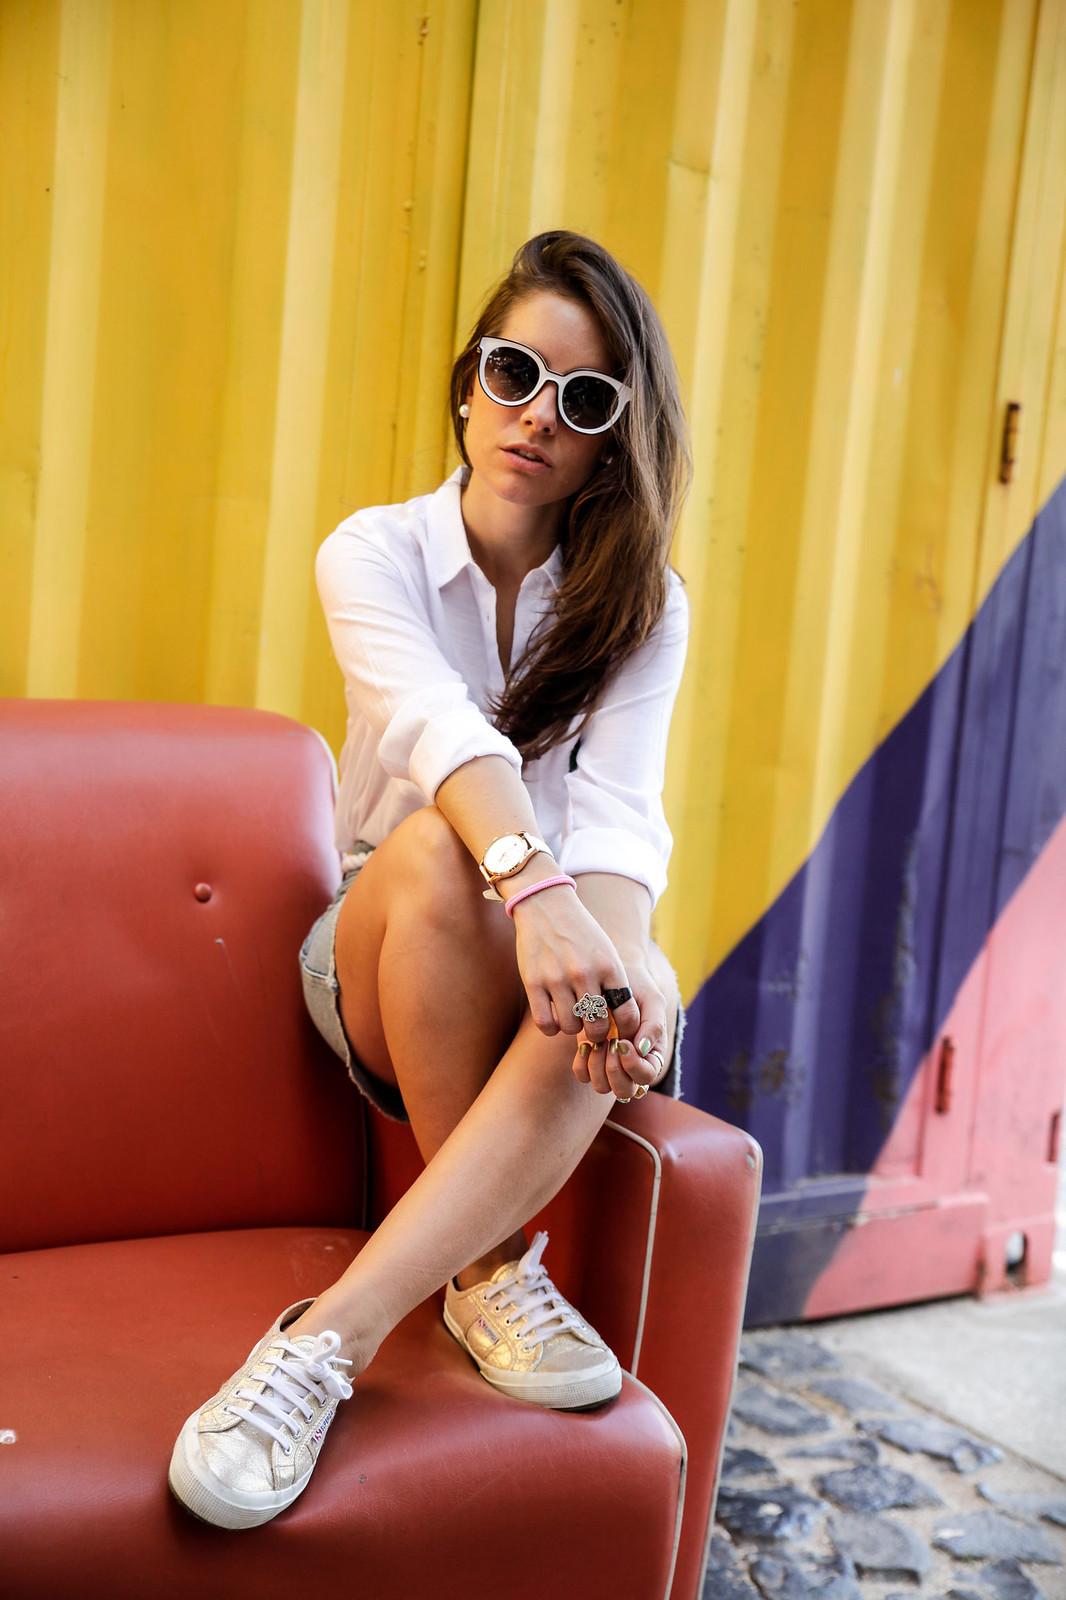 05_instaxday_portugal_lisboa_theguestgirl_.